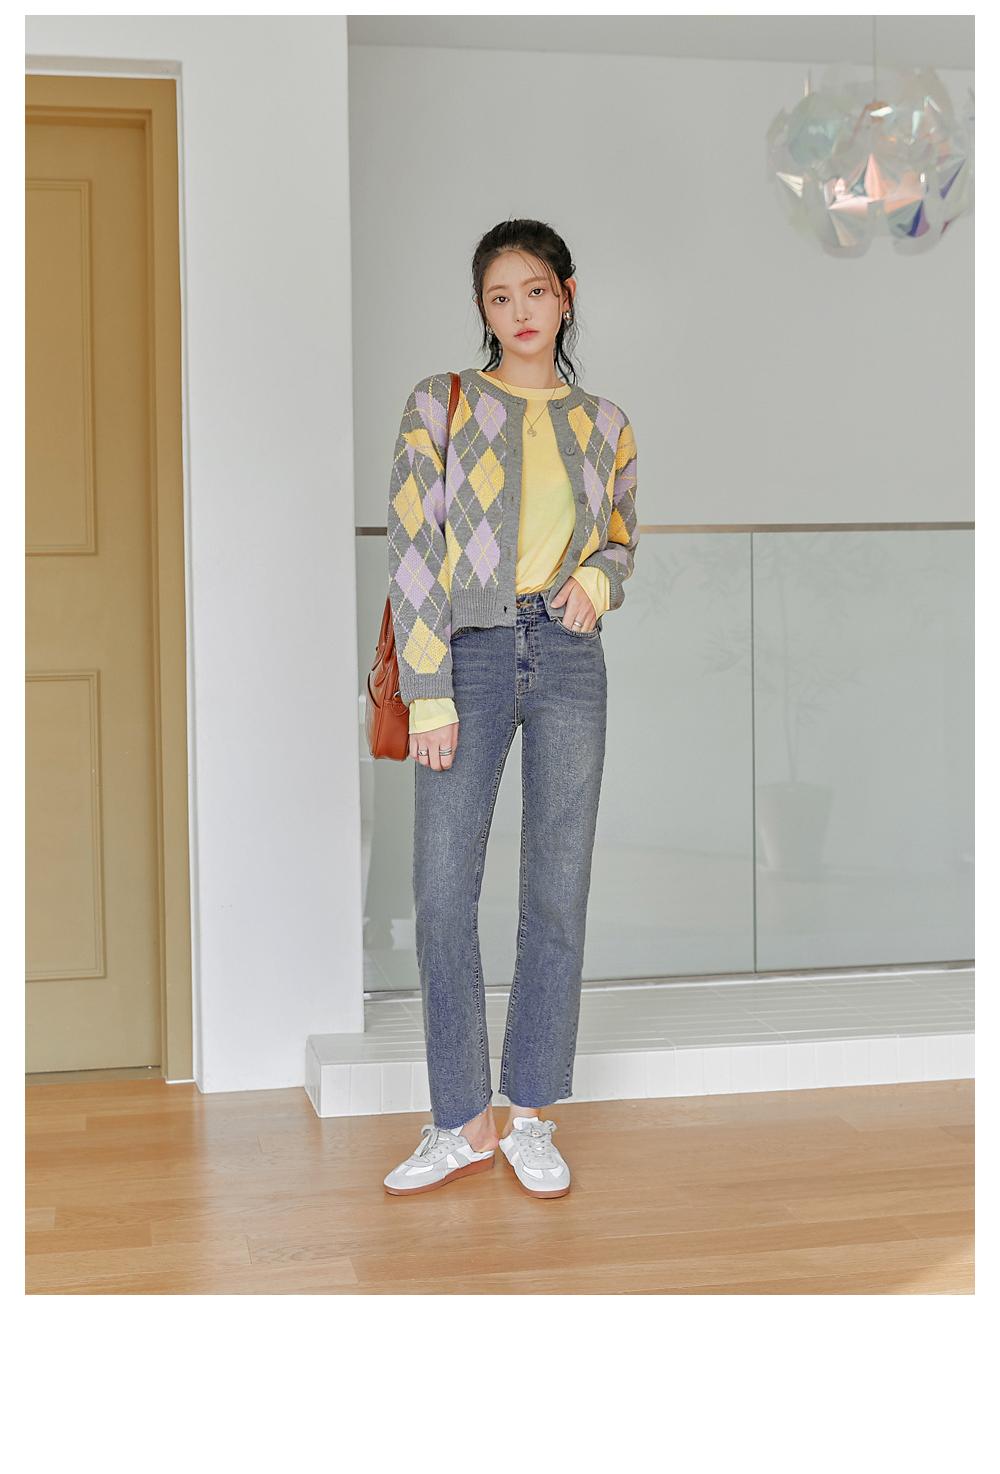 dress model image-S1L35